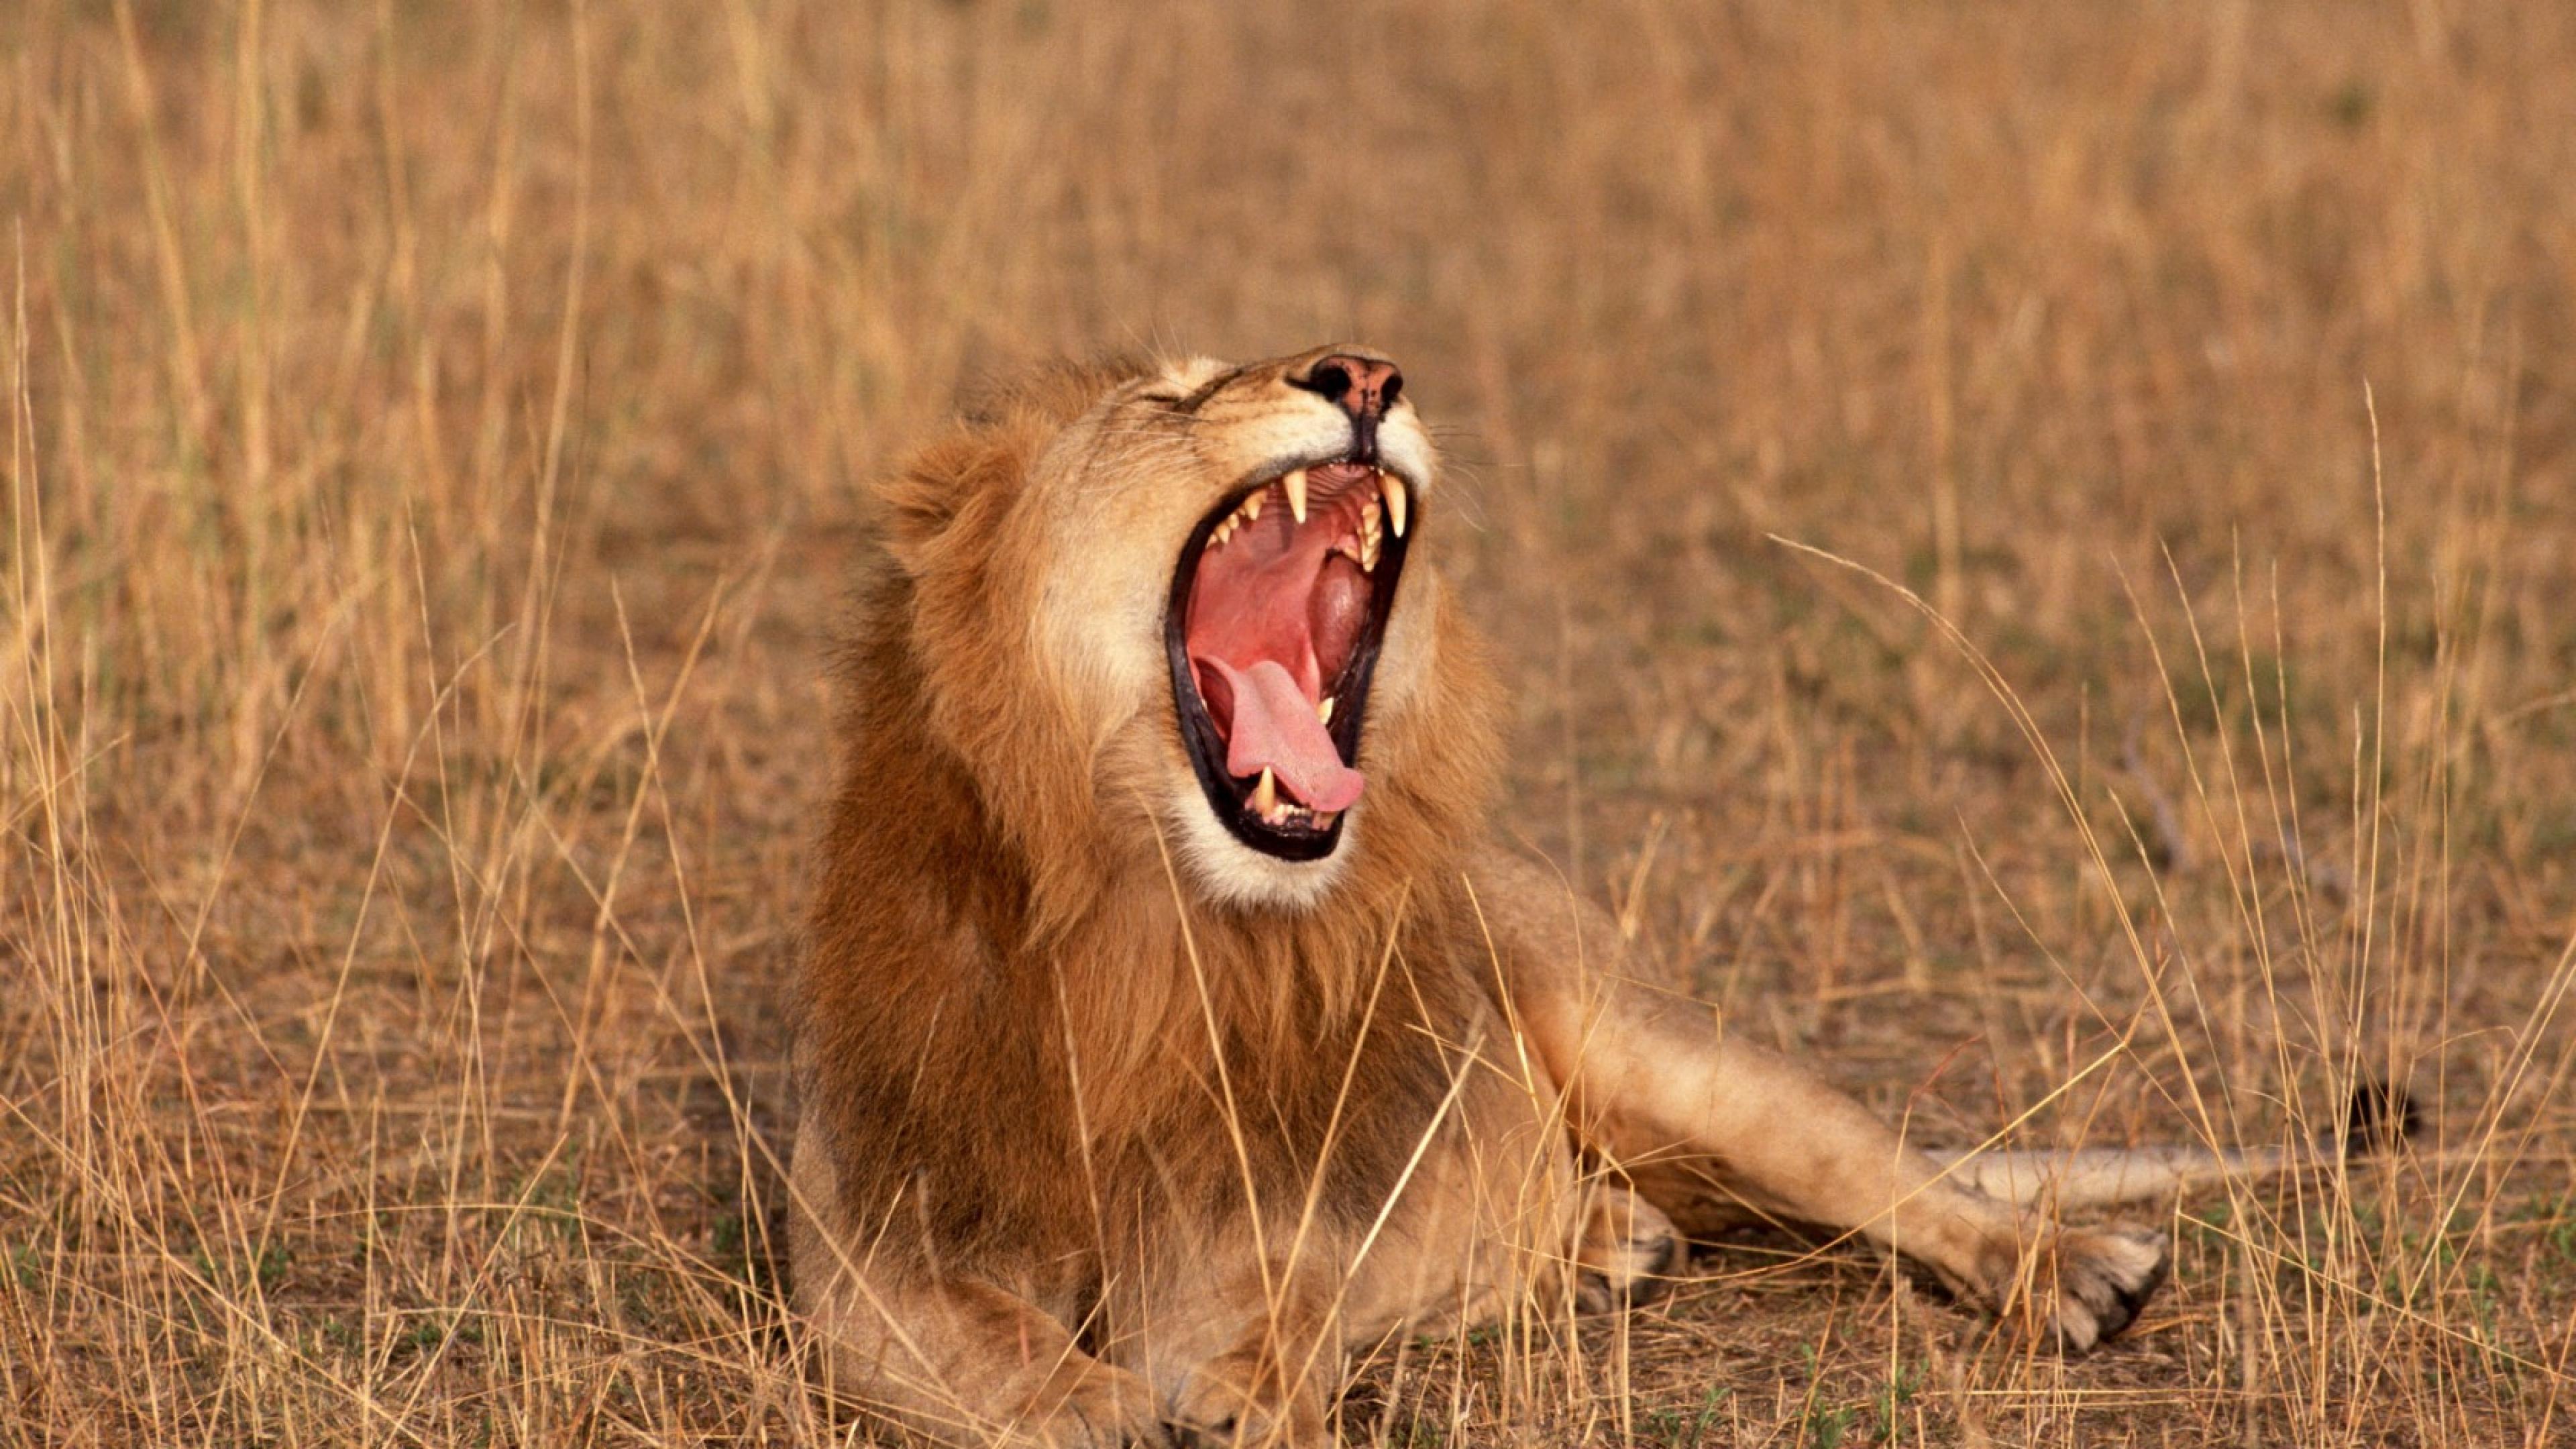 Download Wallpaper 3840x2160 Africa Lion Savannah Animals 4K Ultra 3840x2160